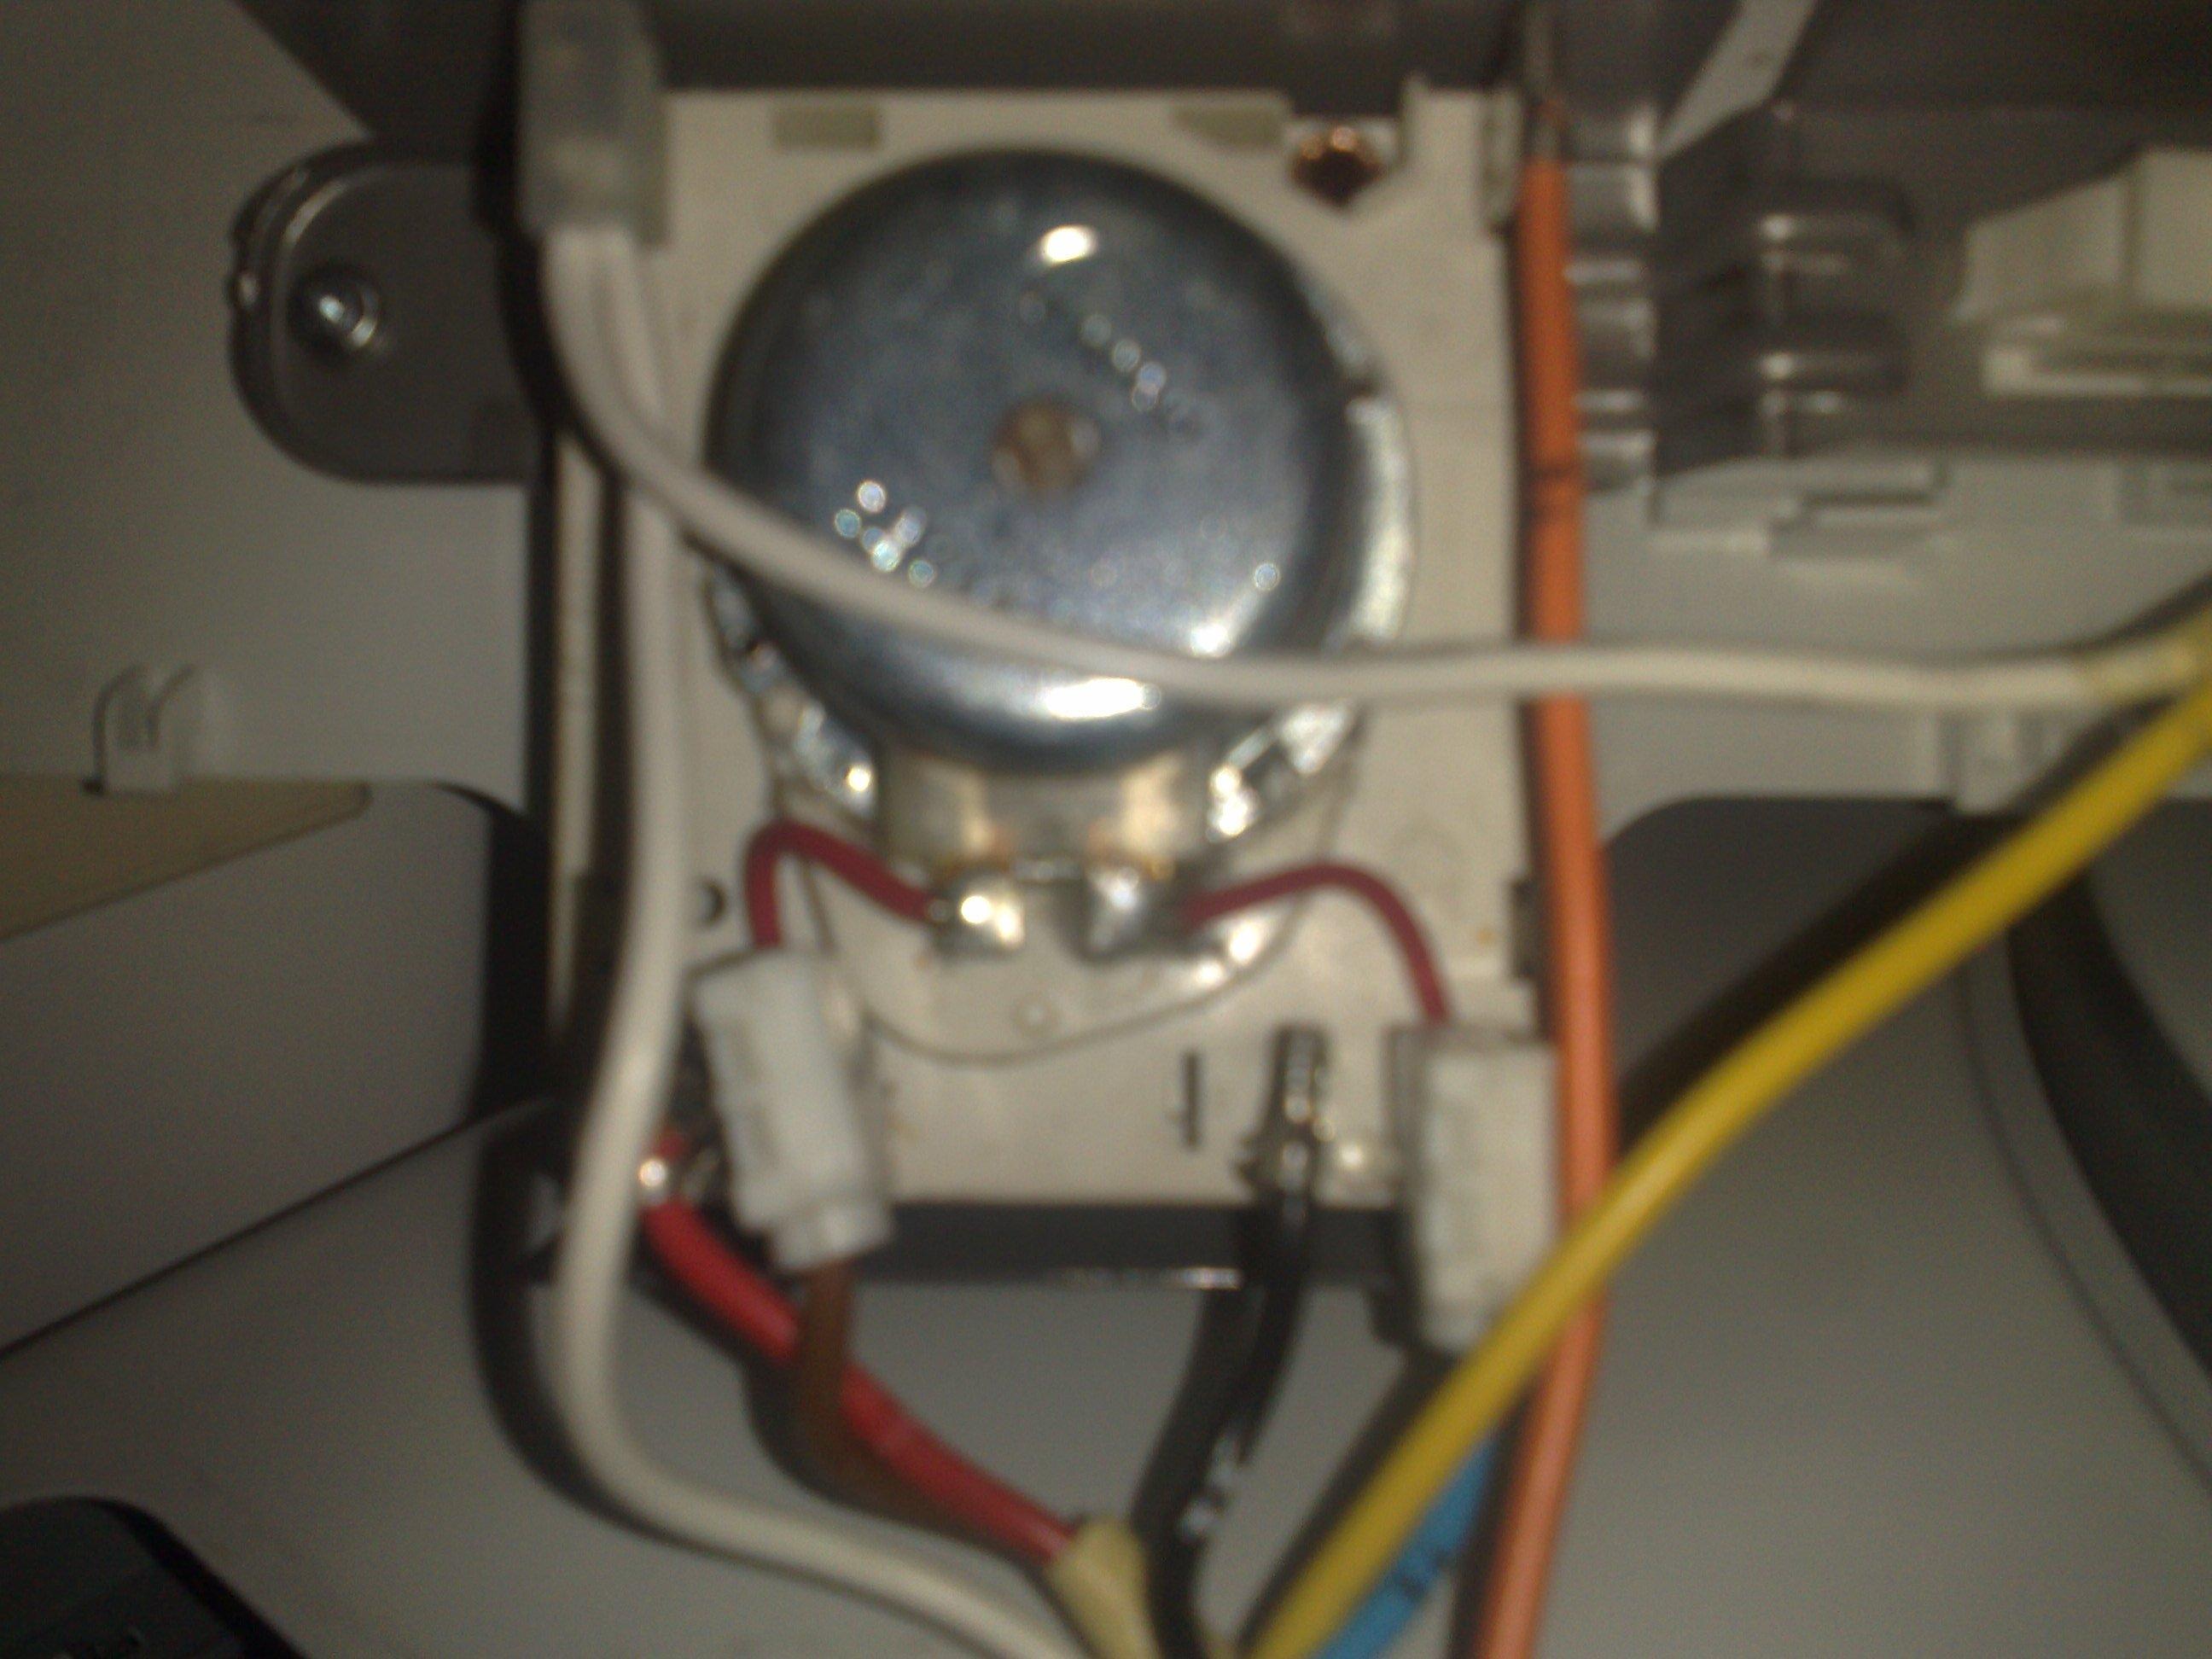 simpson dryer wiring diagram simpson image wiring simpson eziloader clothes dryer electrical schematics for the on simpson dryer wiring diagram